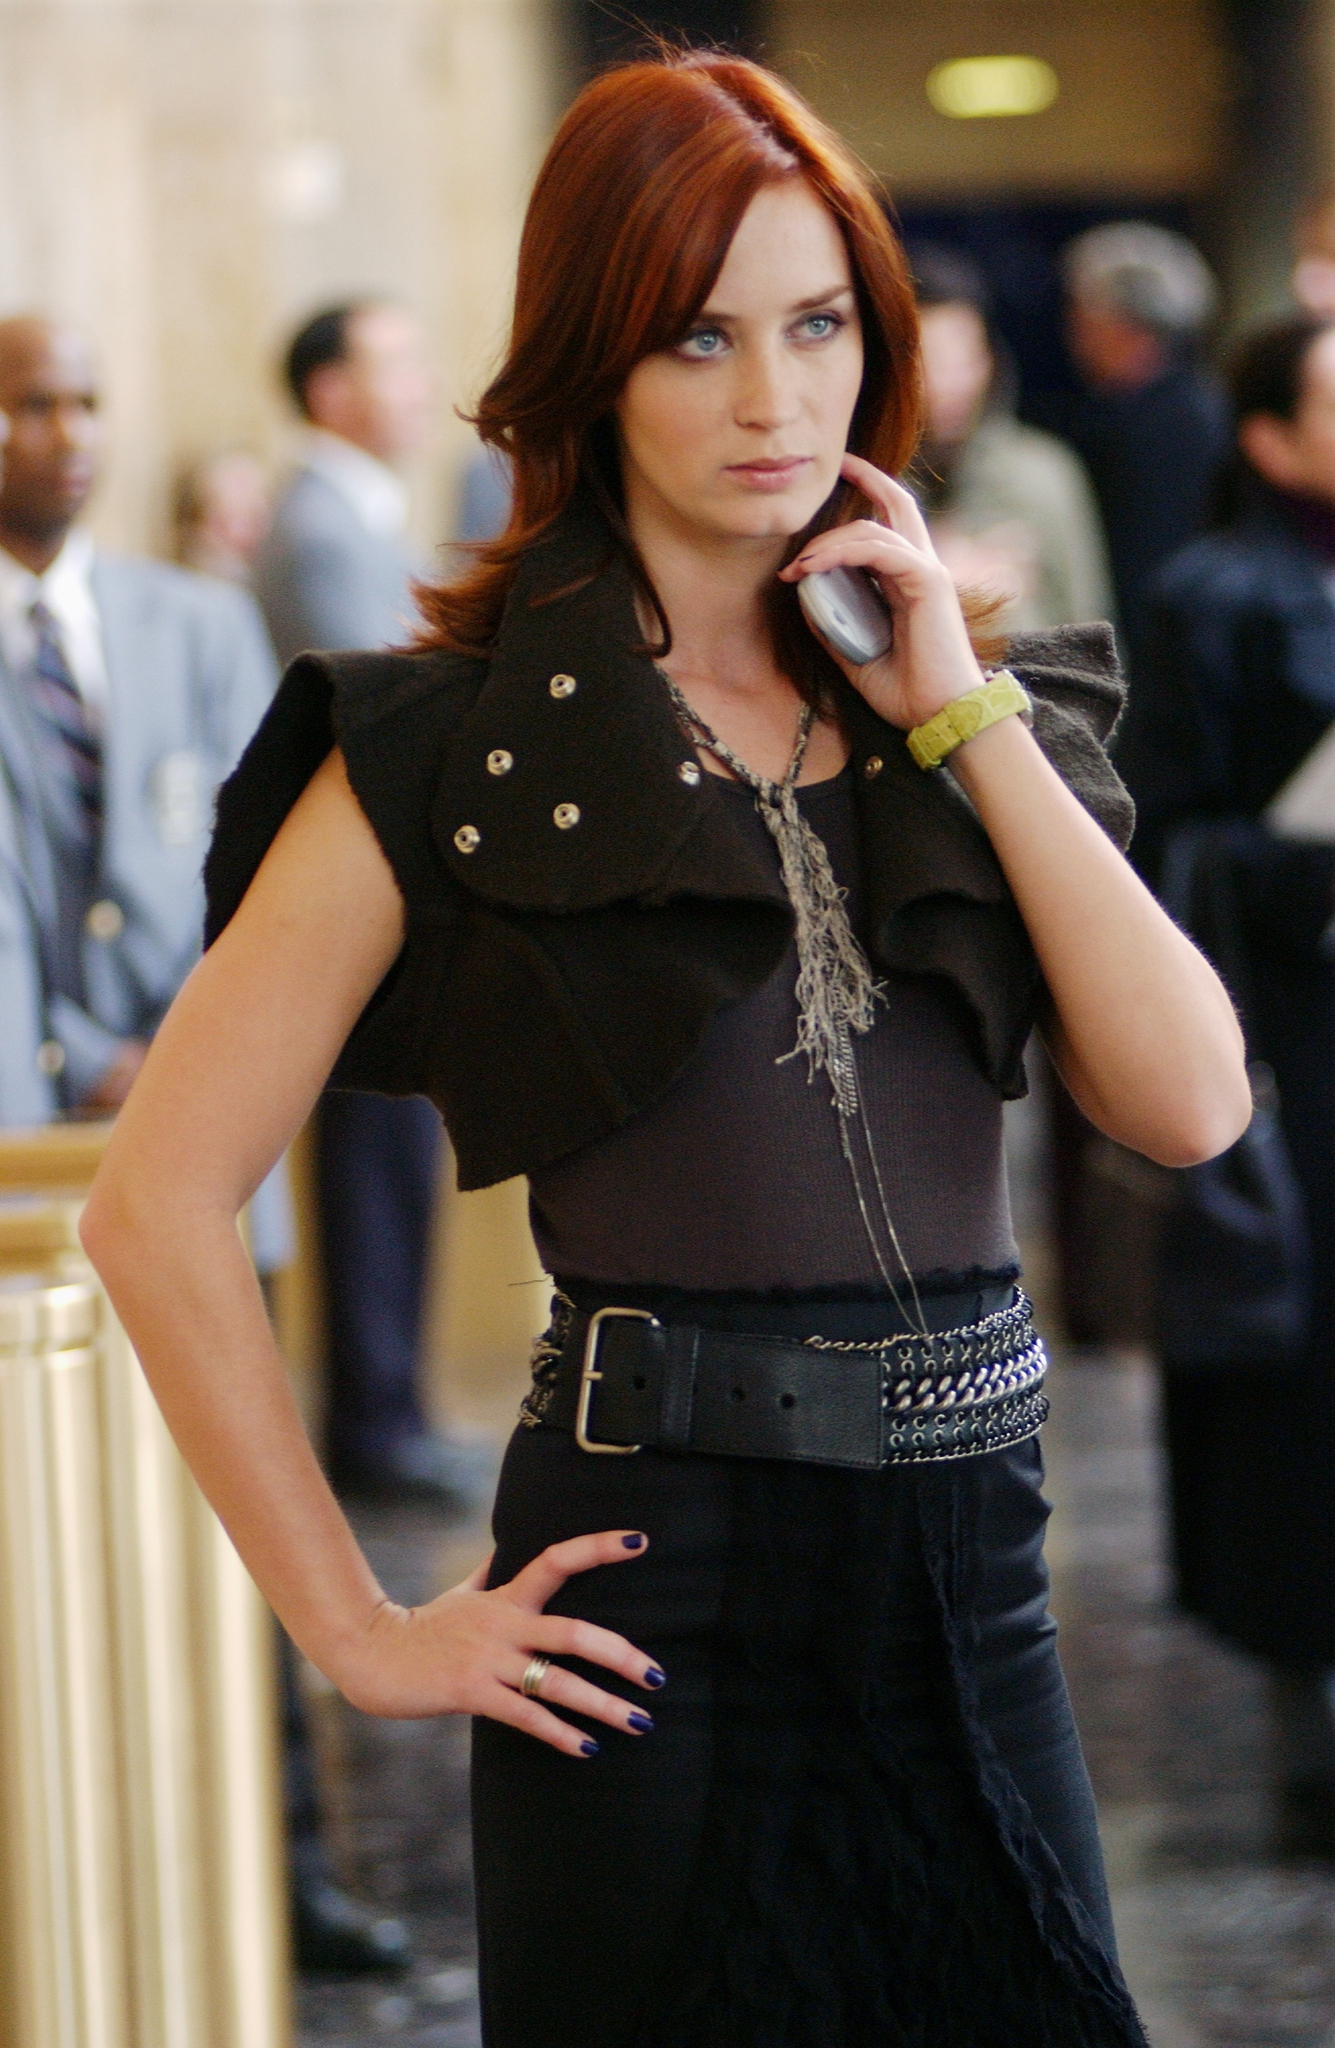 Emily Blunt in The Devil Wears Prada (2006)